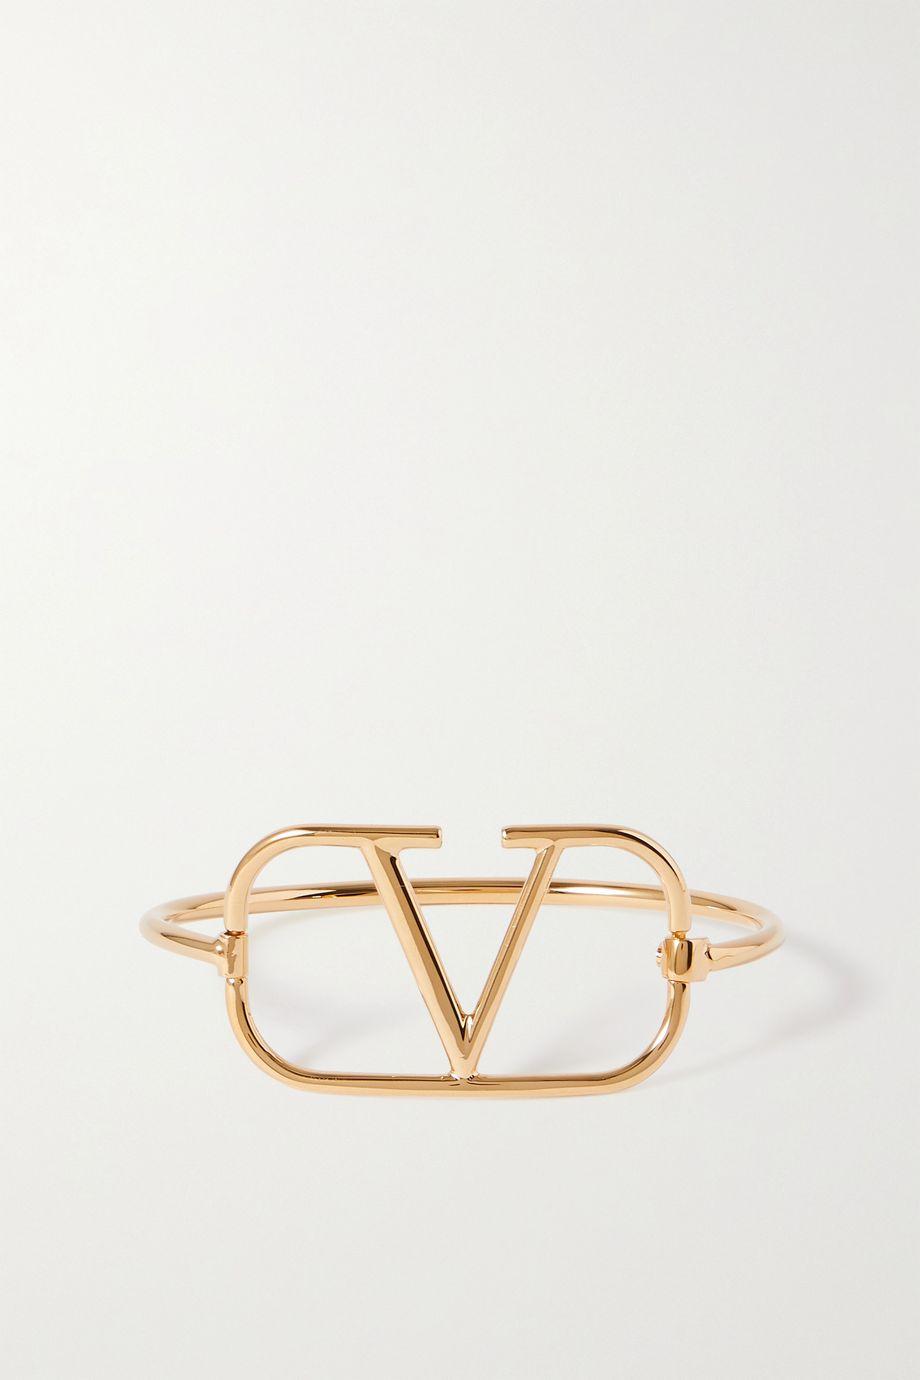 Valentino Bracelet doré VLOGO Valentino Garavani